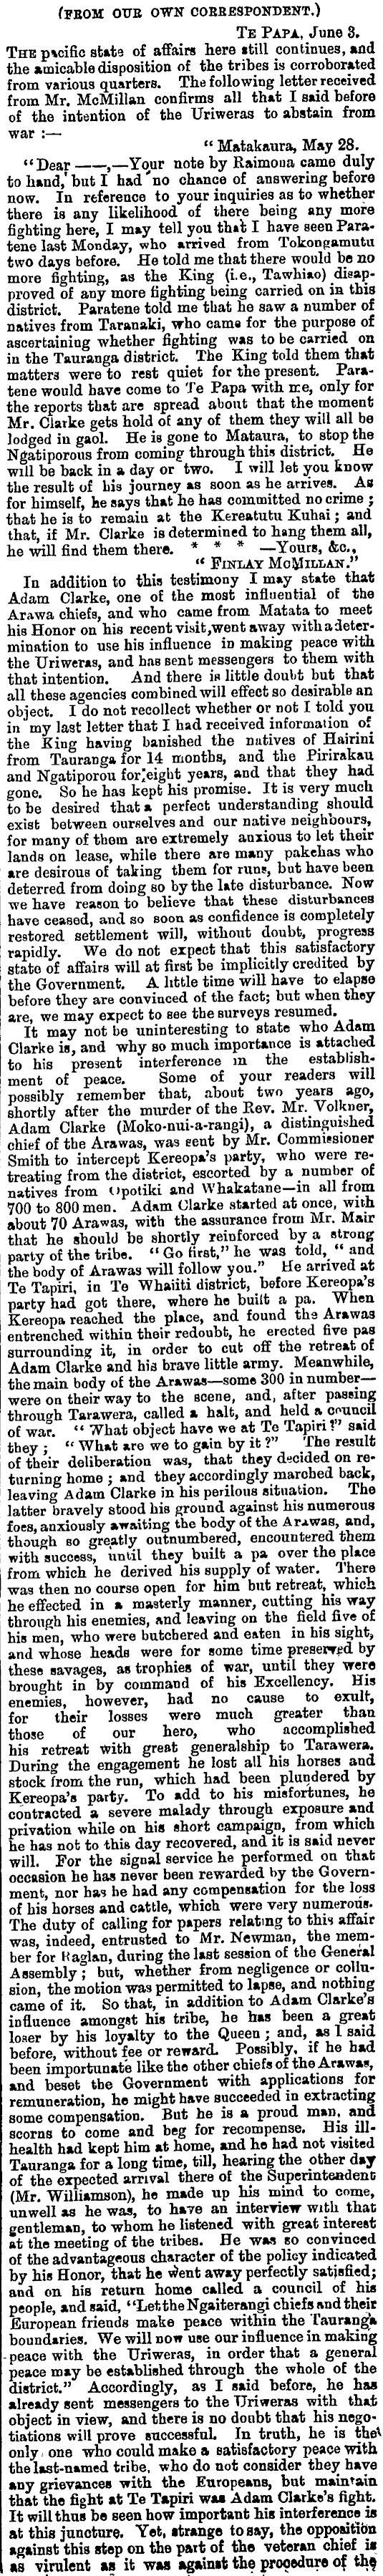 1867 Finlay McMillan Tauranga Te Papa informant